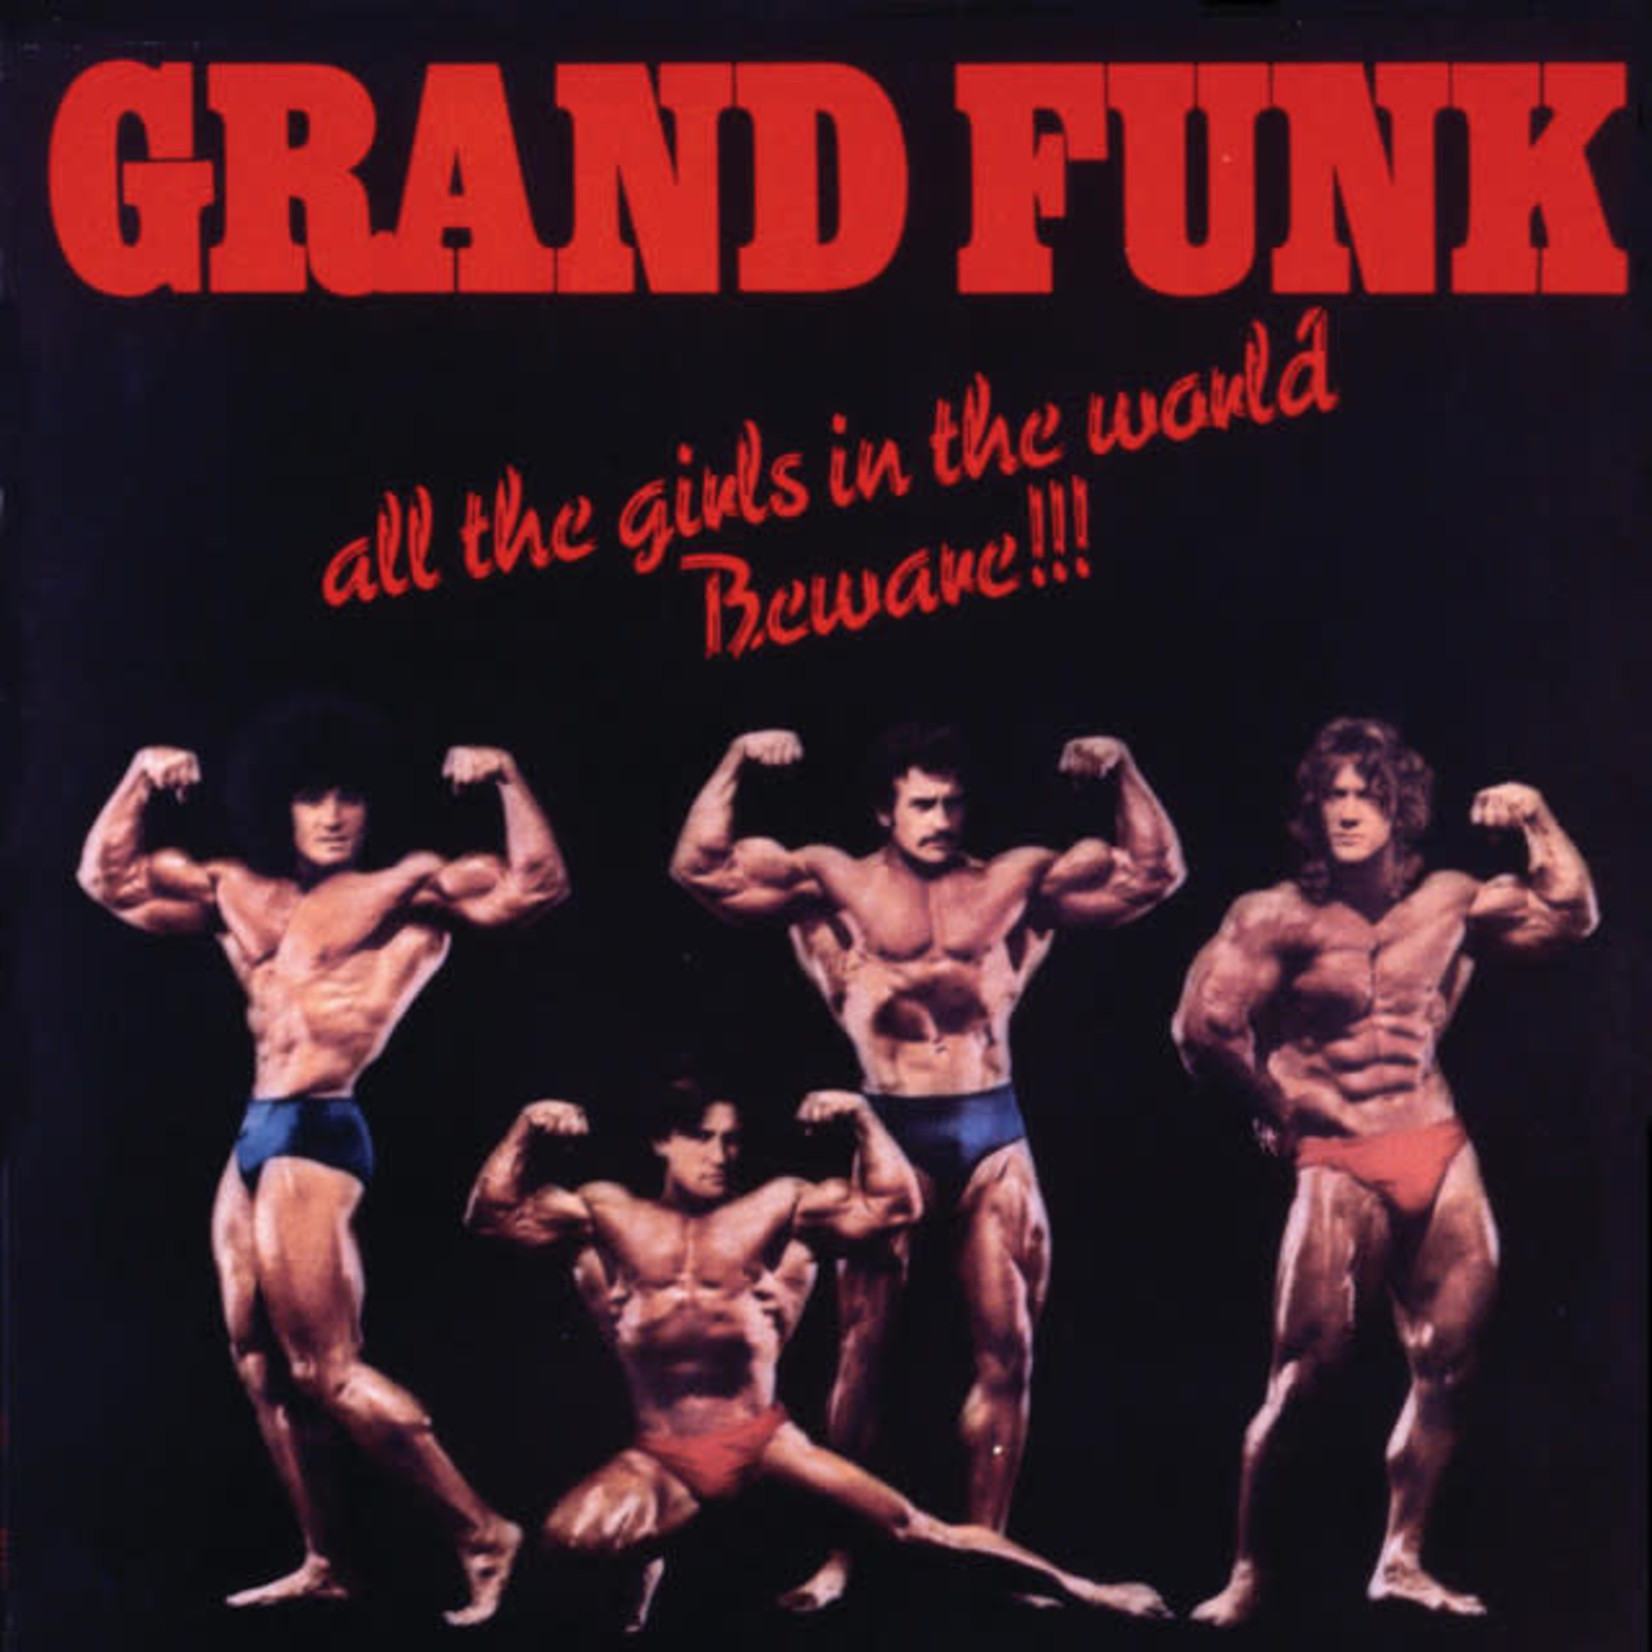 Compact Disc Grand Funk - All The Girls In The World Beware (SACD)